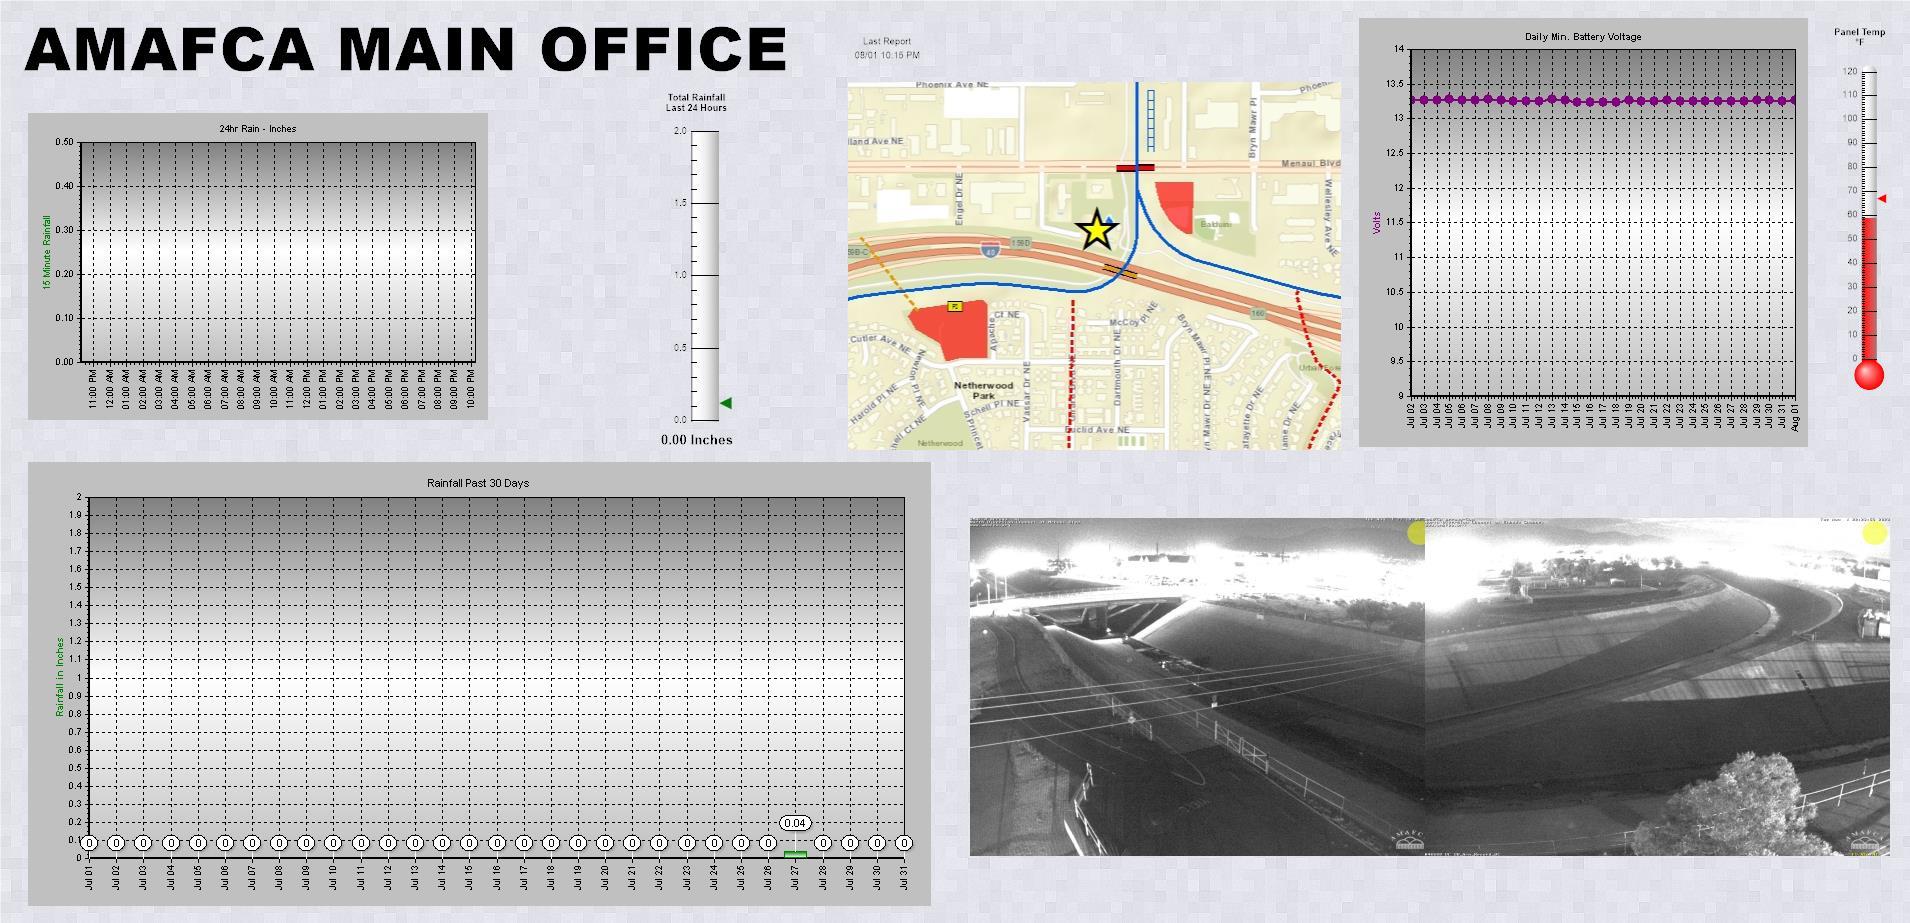 AMAFCA Office telemetry data